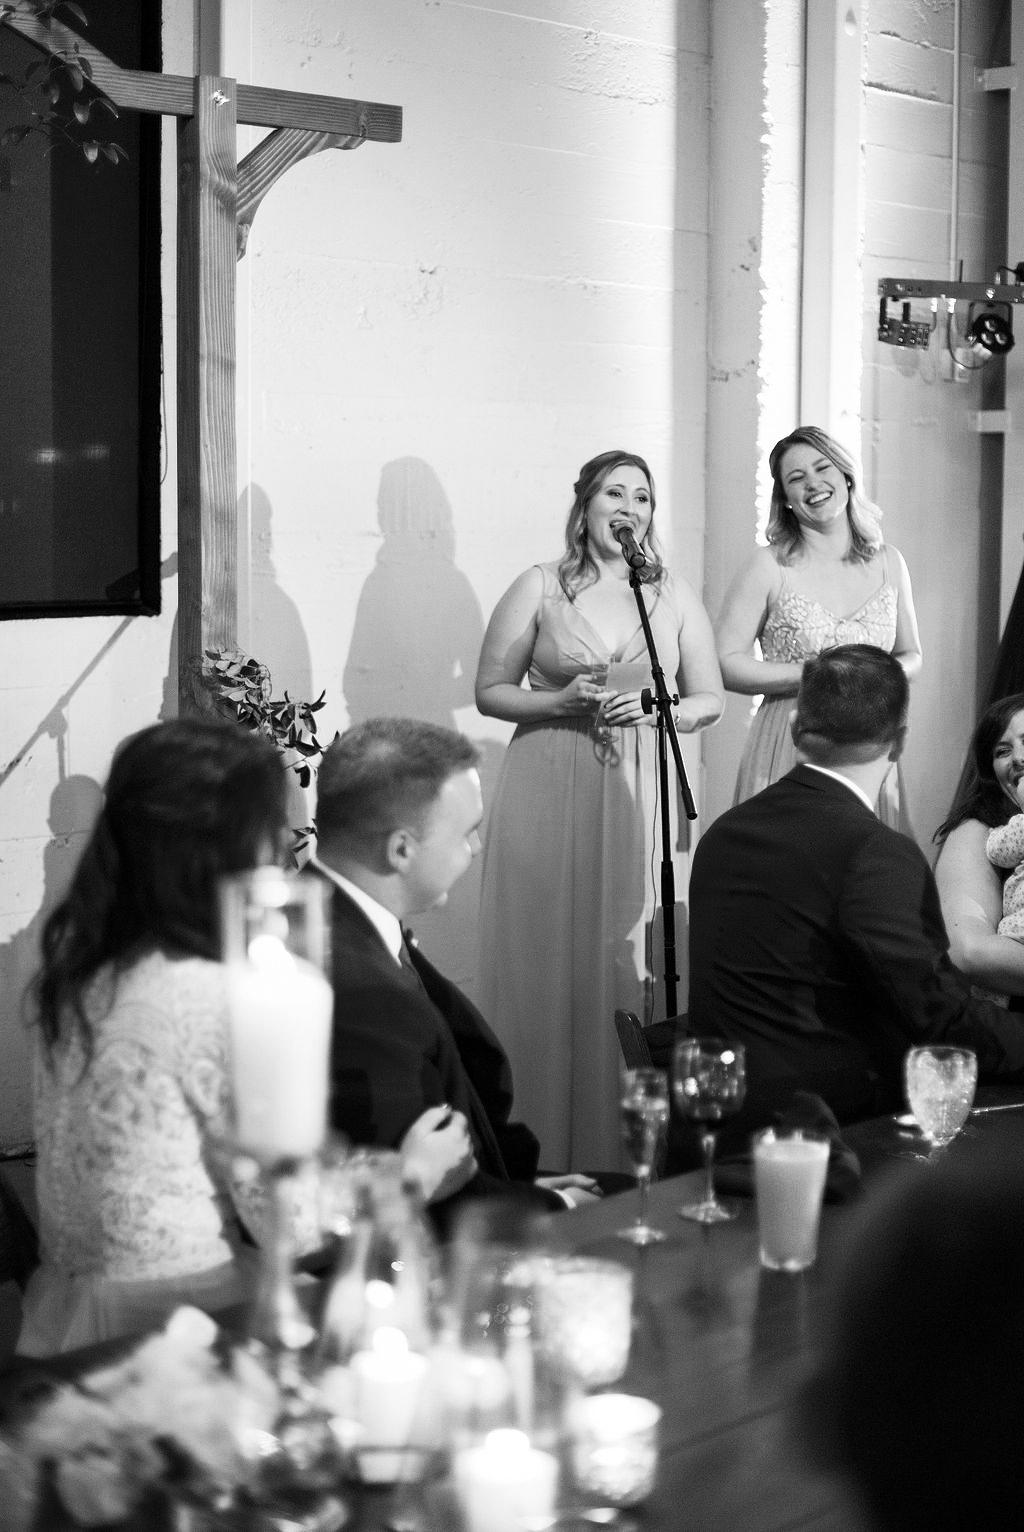 020_reception_portland,oregon,castaway,wedding,by_outlive_creative,photo,and,video.jpg